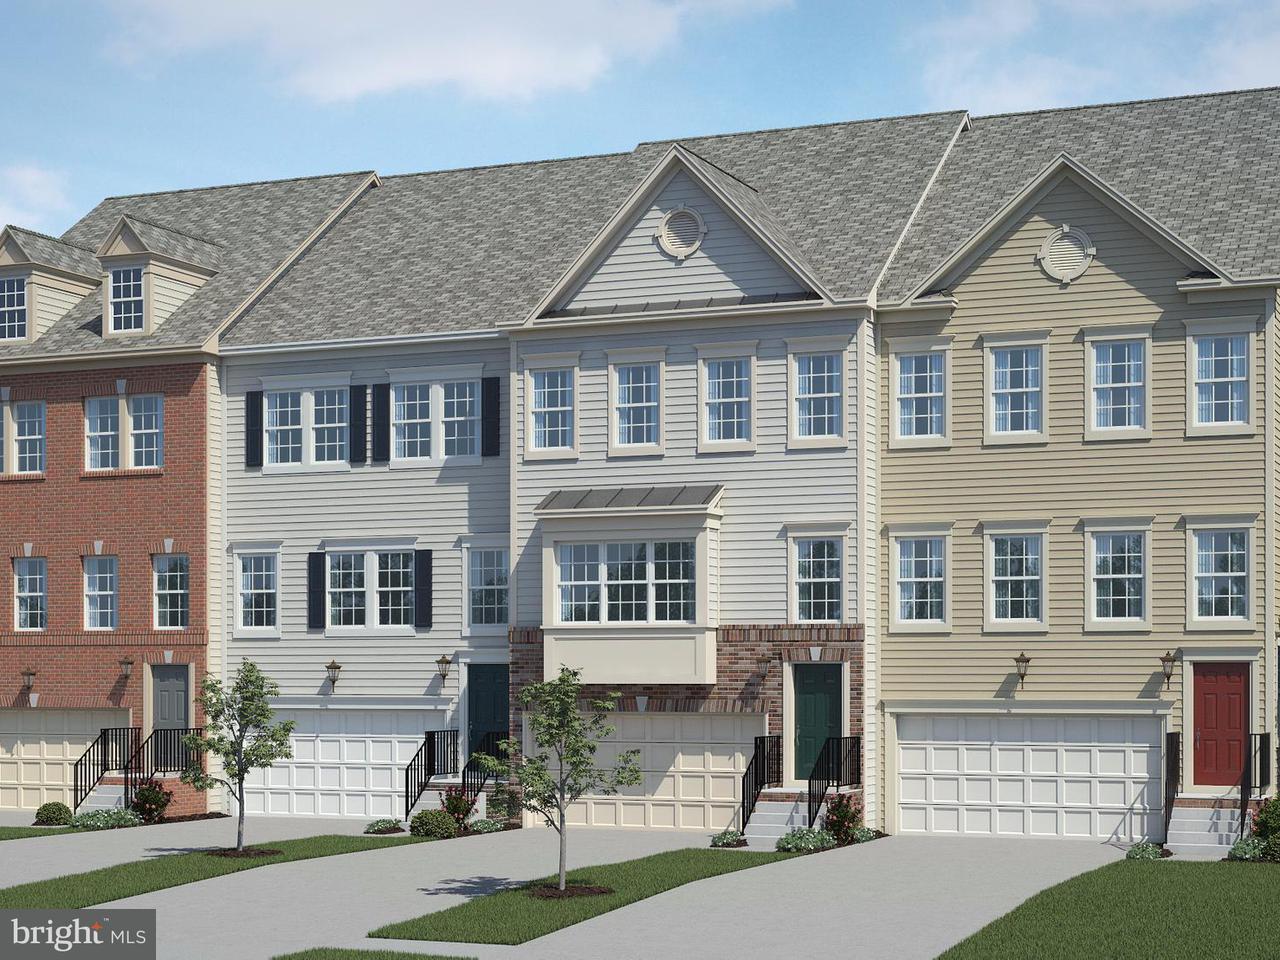 Townhouse for Sale at 2507 HYACINTH Lane 2507 HYACINTH Lane Gambrills, Maryland 21054 United States